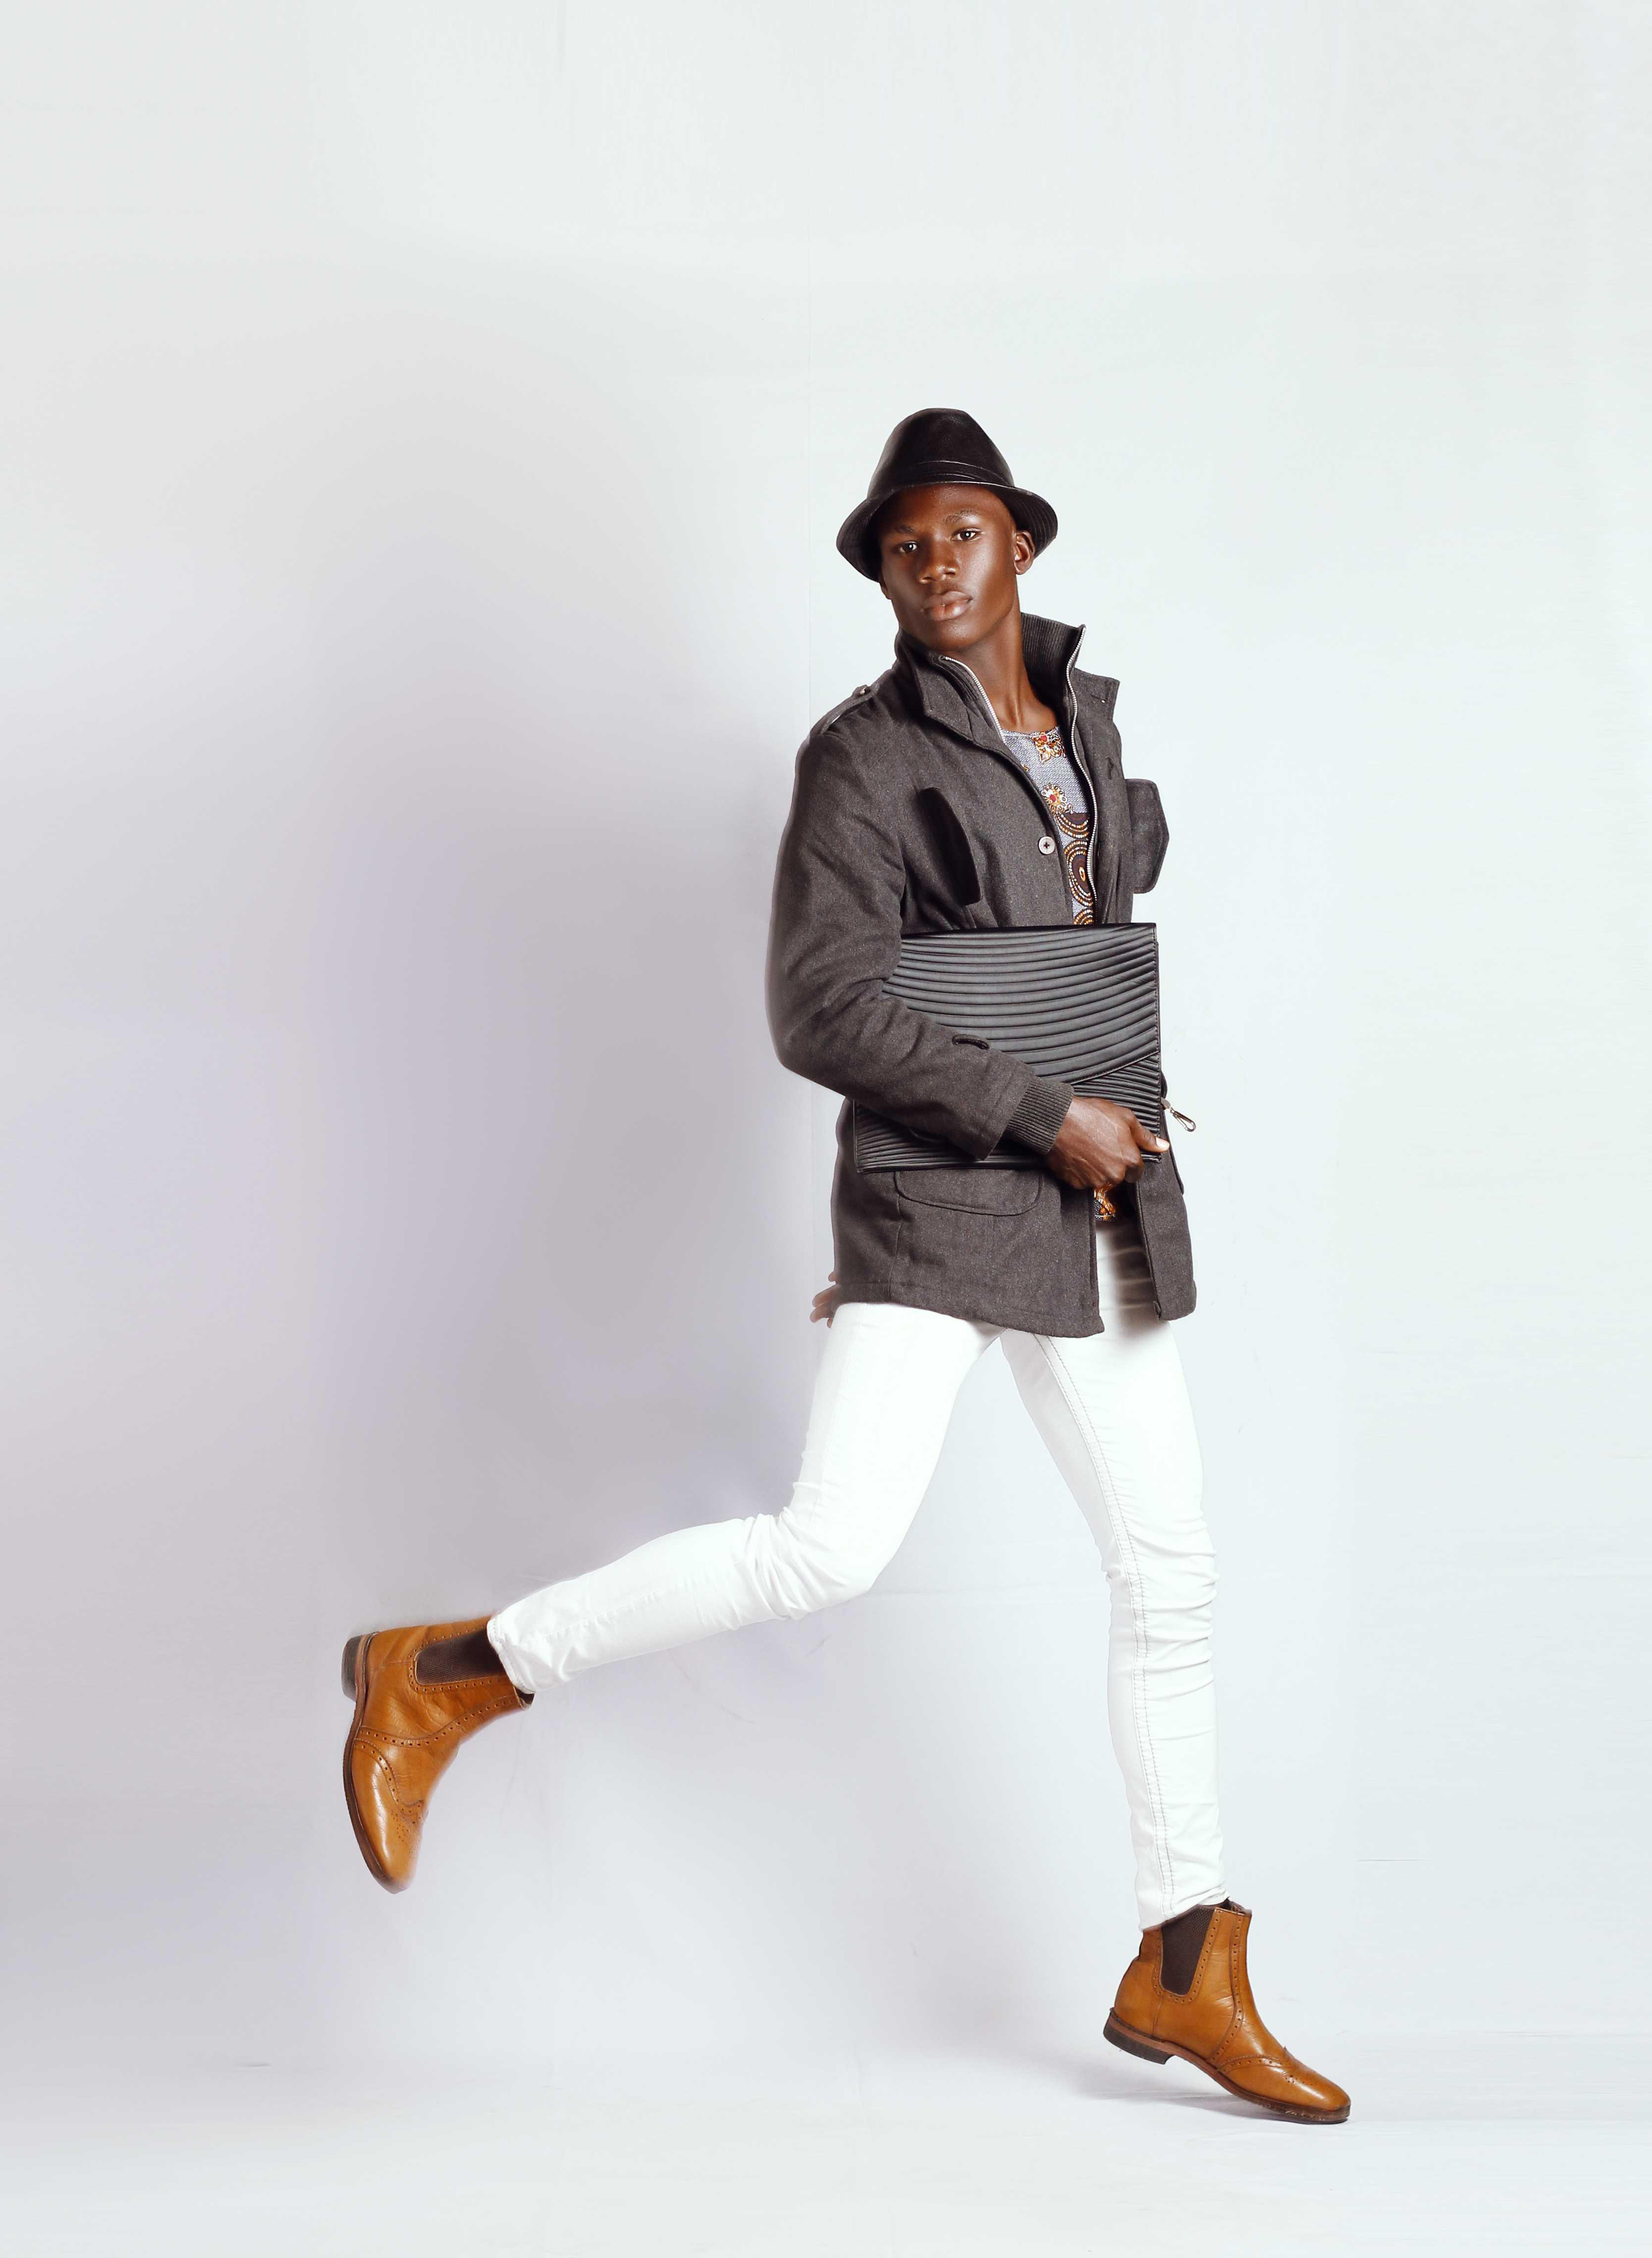 victor nduka in agency shoot